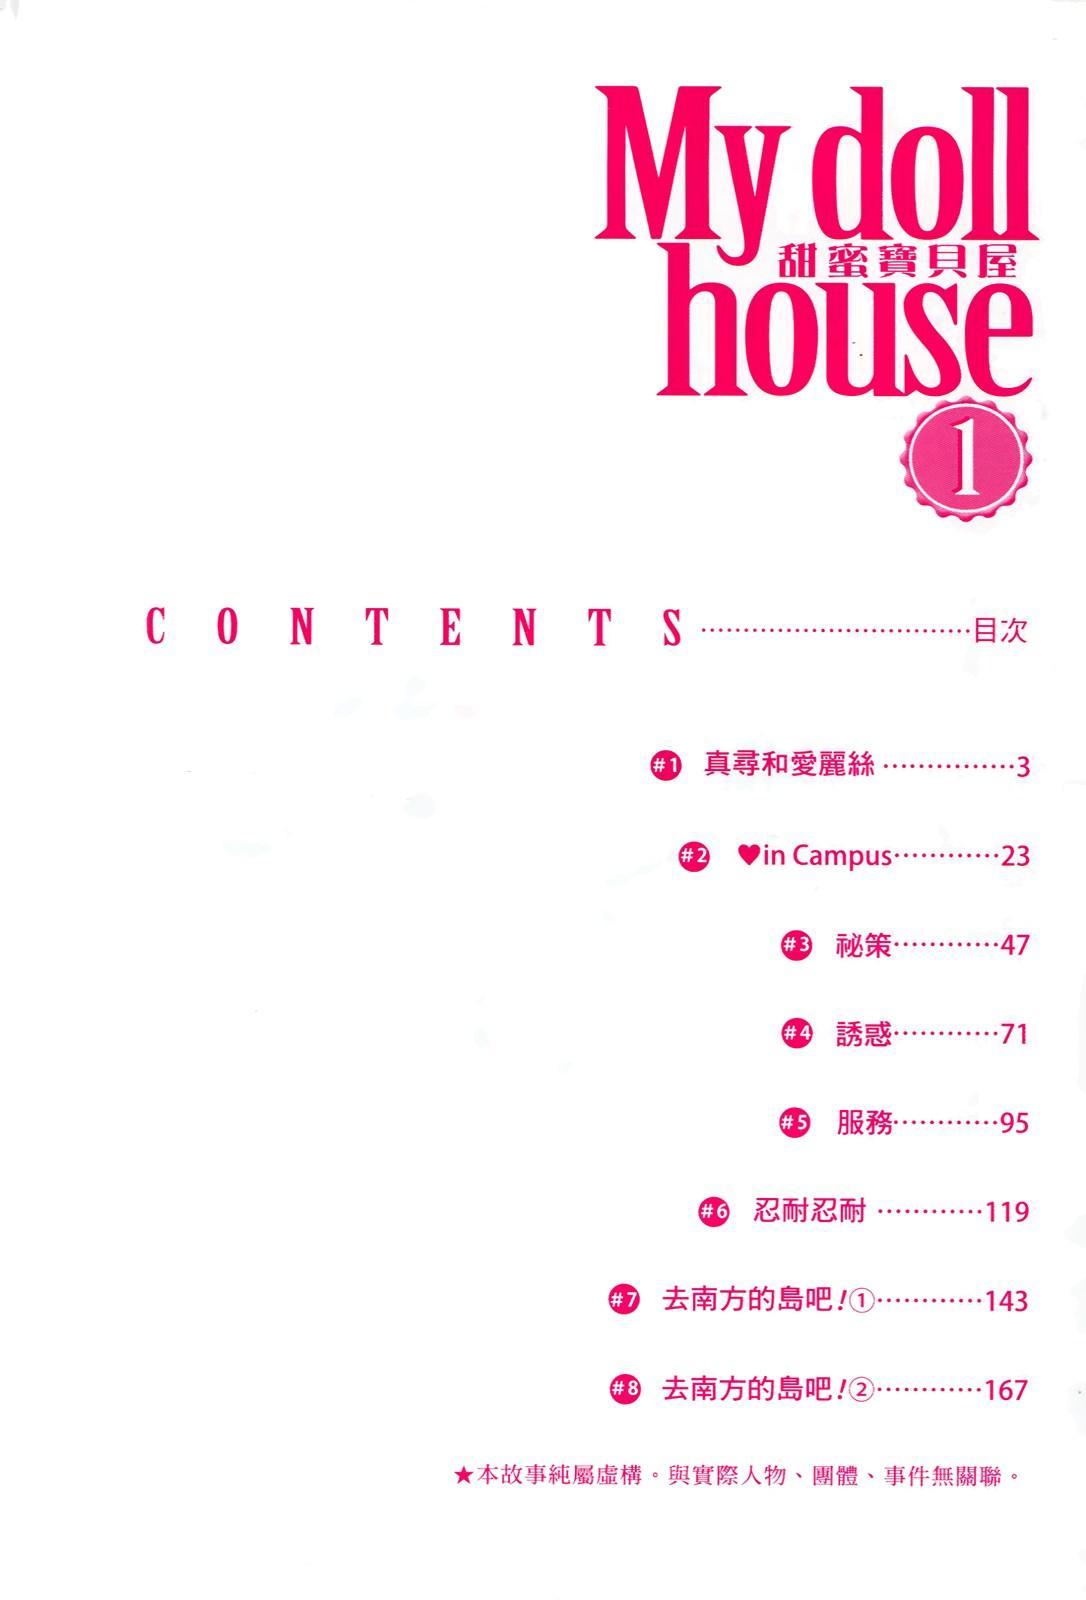 My doll house 1   甜蜜寶貝屋 1 3